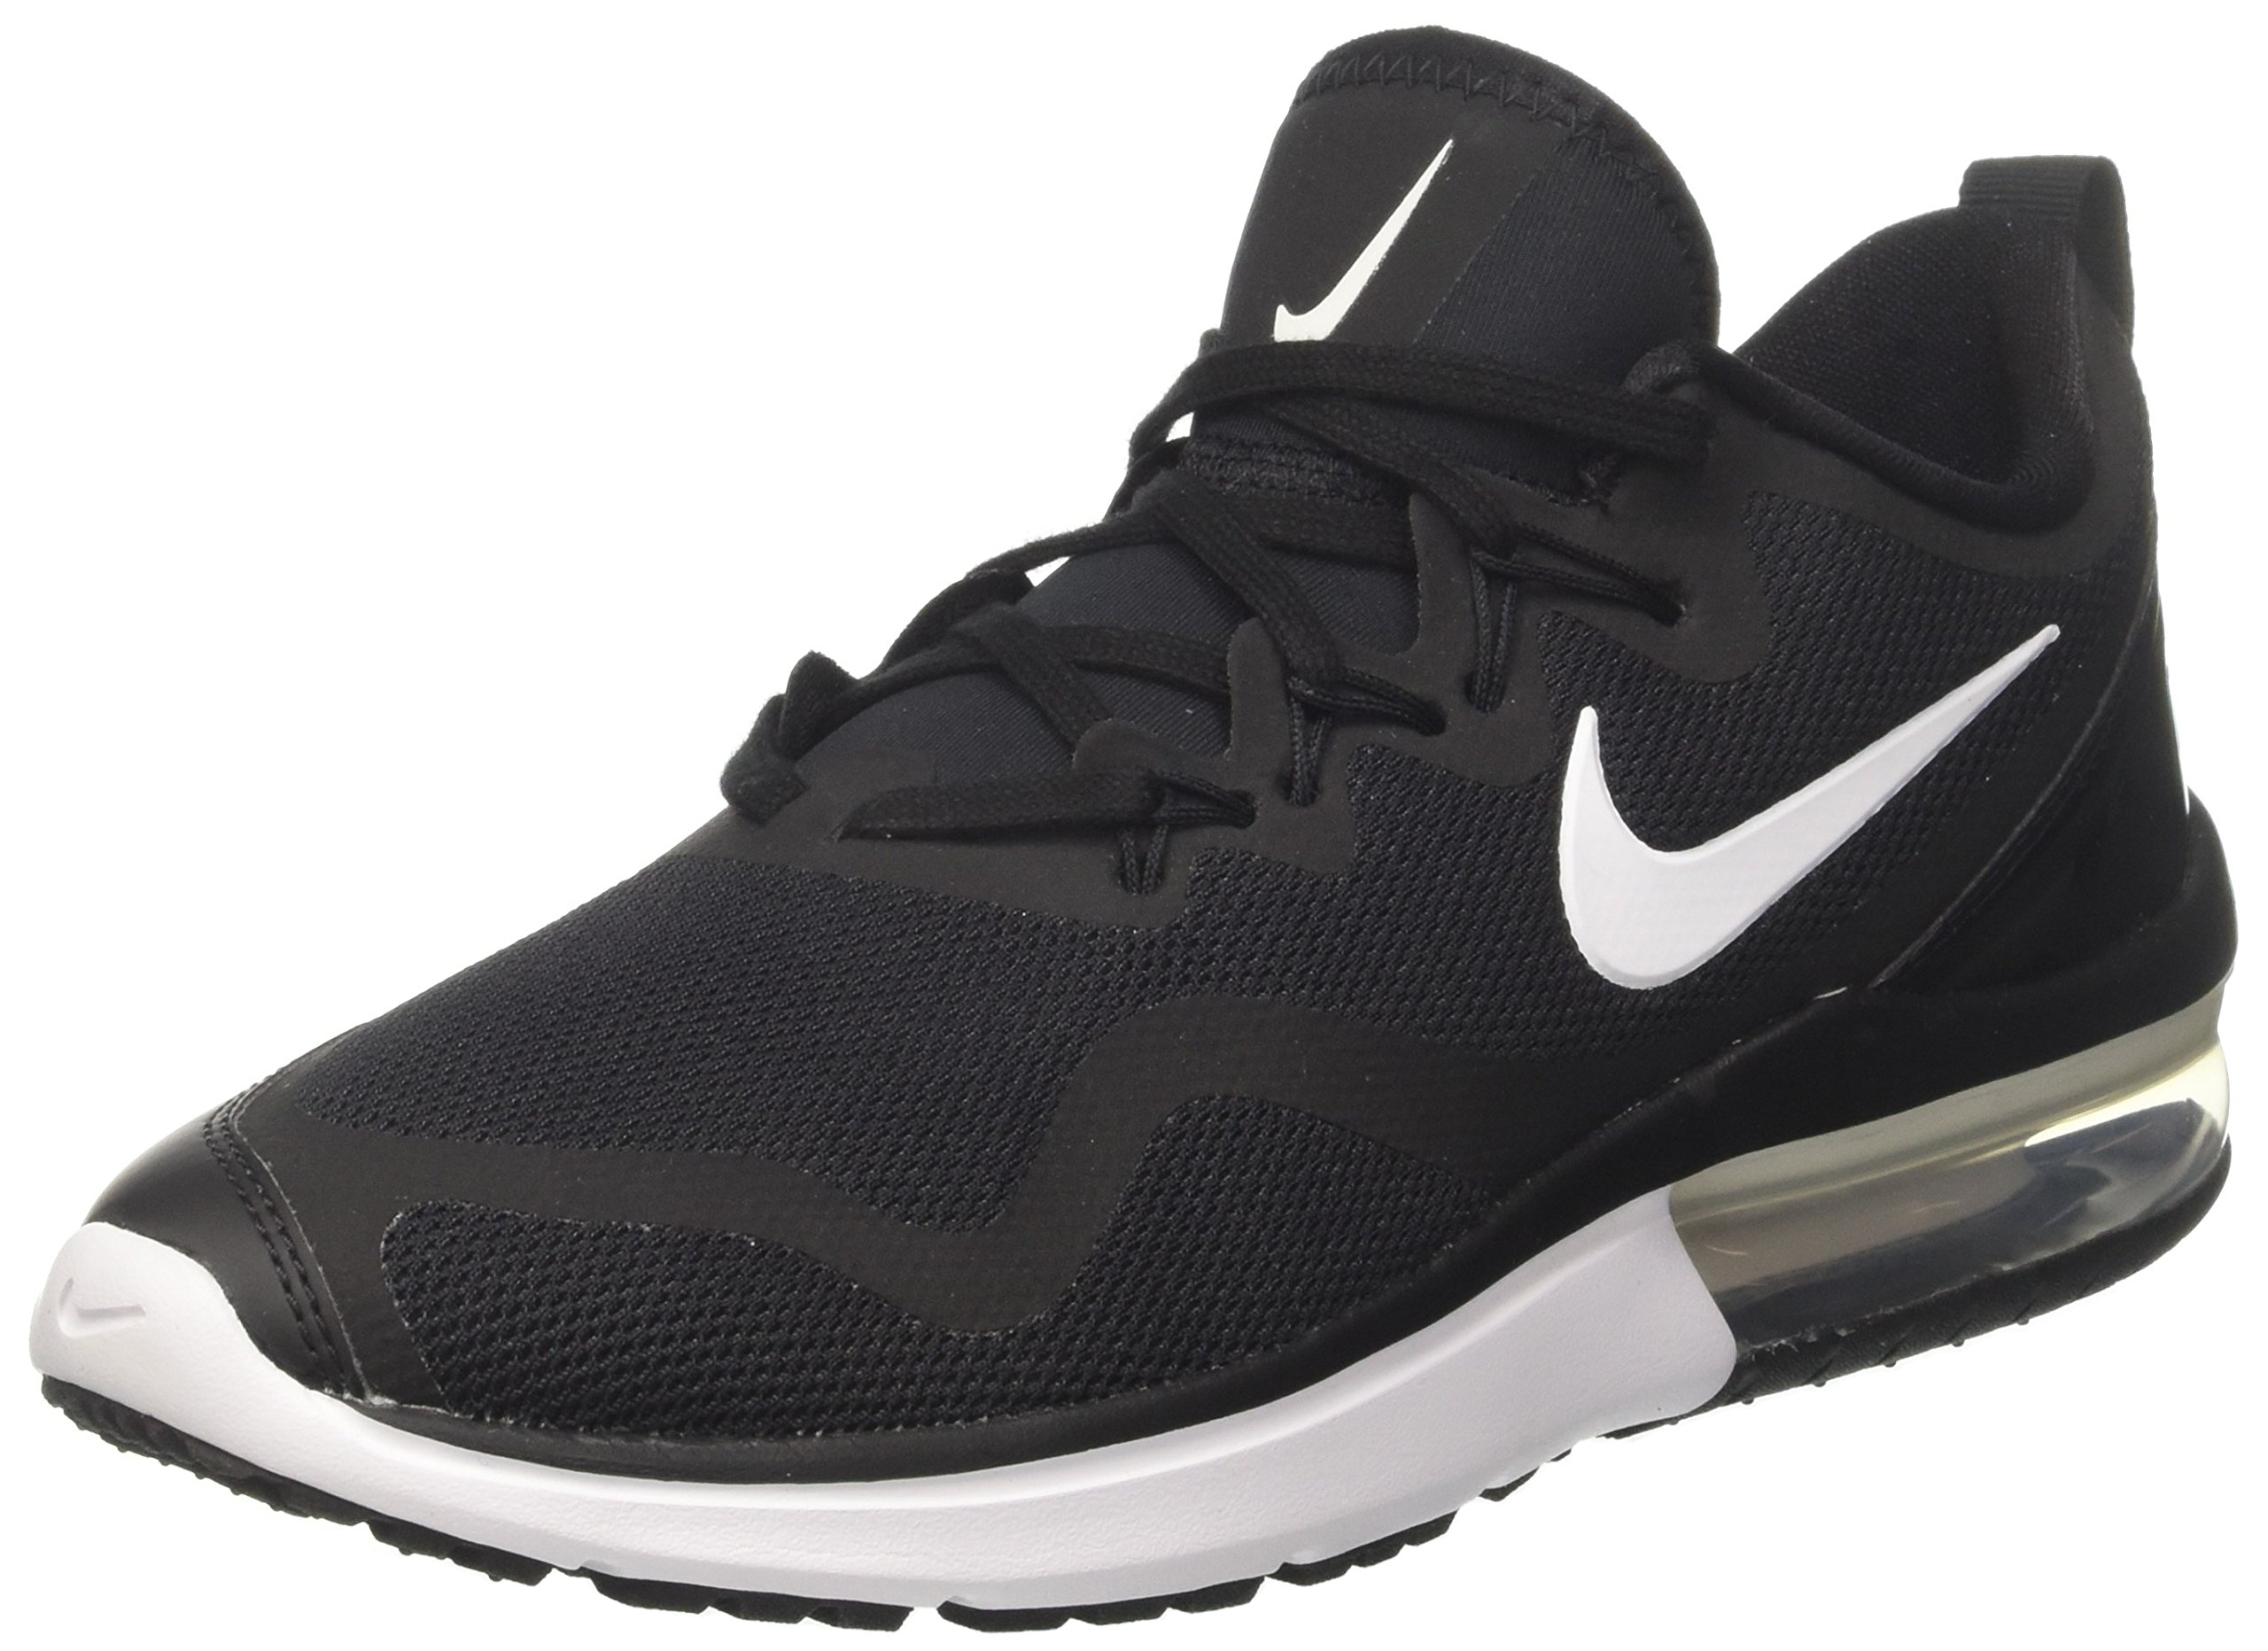 08c62b9236 Galleon - Nike Women's Air Max Fury Black/White-Black Low Top Cross Trainer  Shoe - 7M